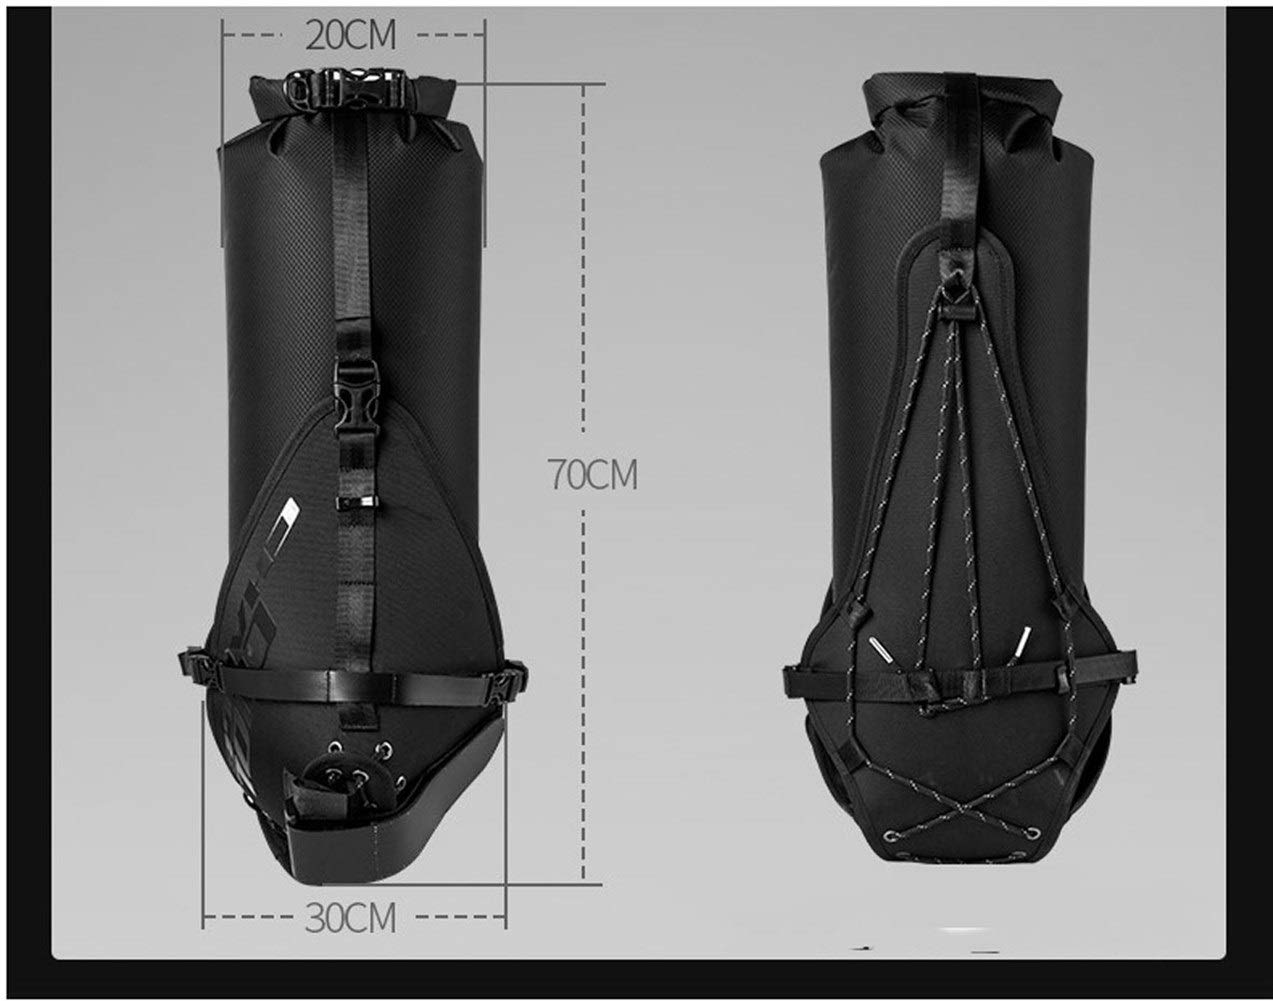 clásico atemporal Water-proof bag Bicicleta cola cola cola bolsa completa impermeable bicicleta de montaña bolsillo trasero bolsa colgante marco trasero resistente a los rasgones bolsa de montar bicicleta de Cocheretera equipo de bicicleta  ¡no ser extrañado!